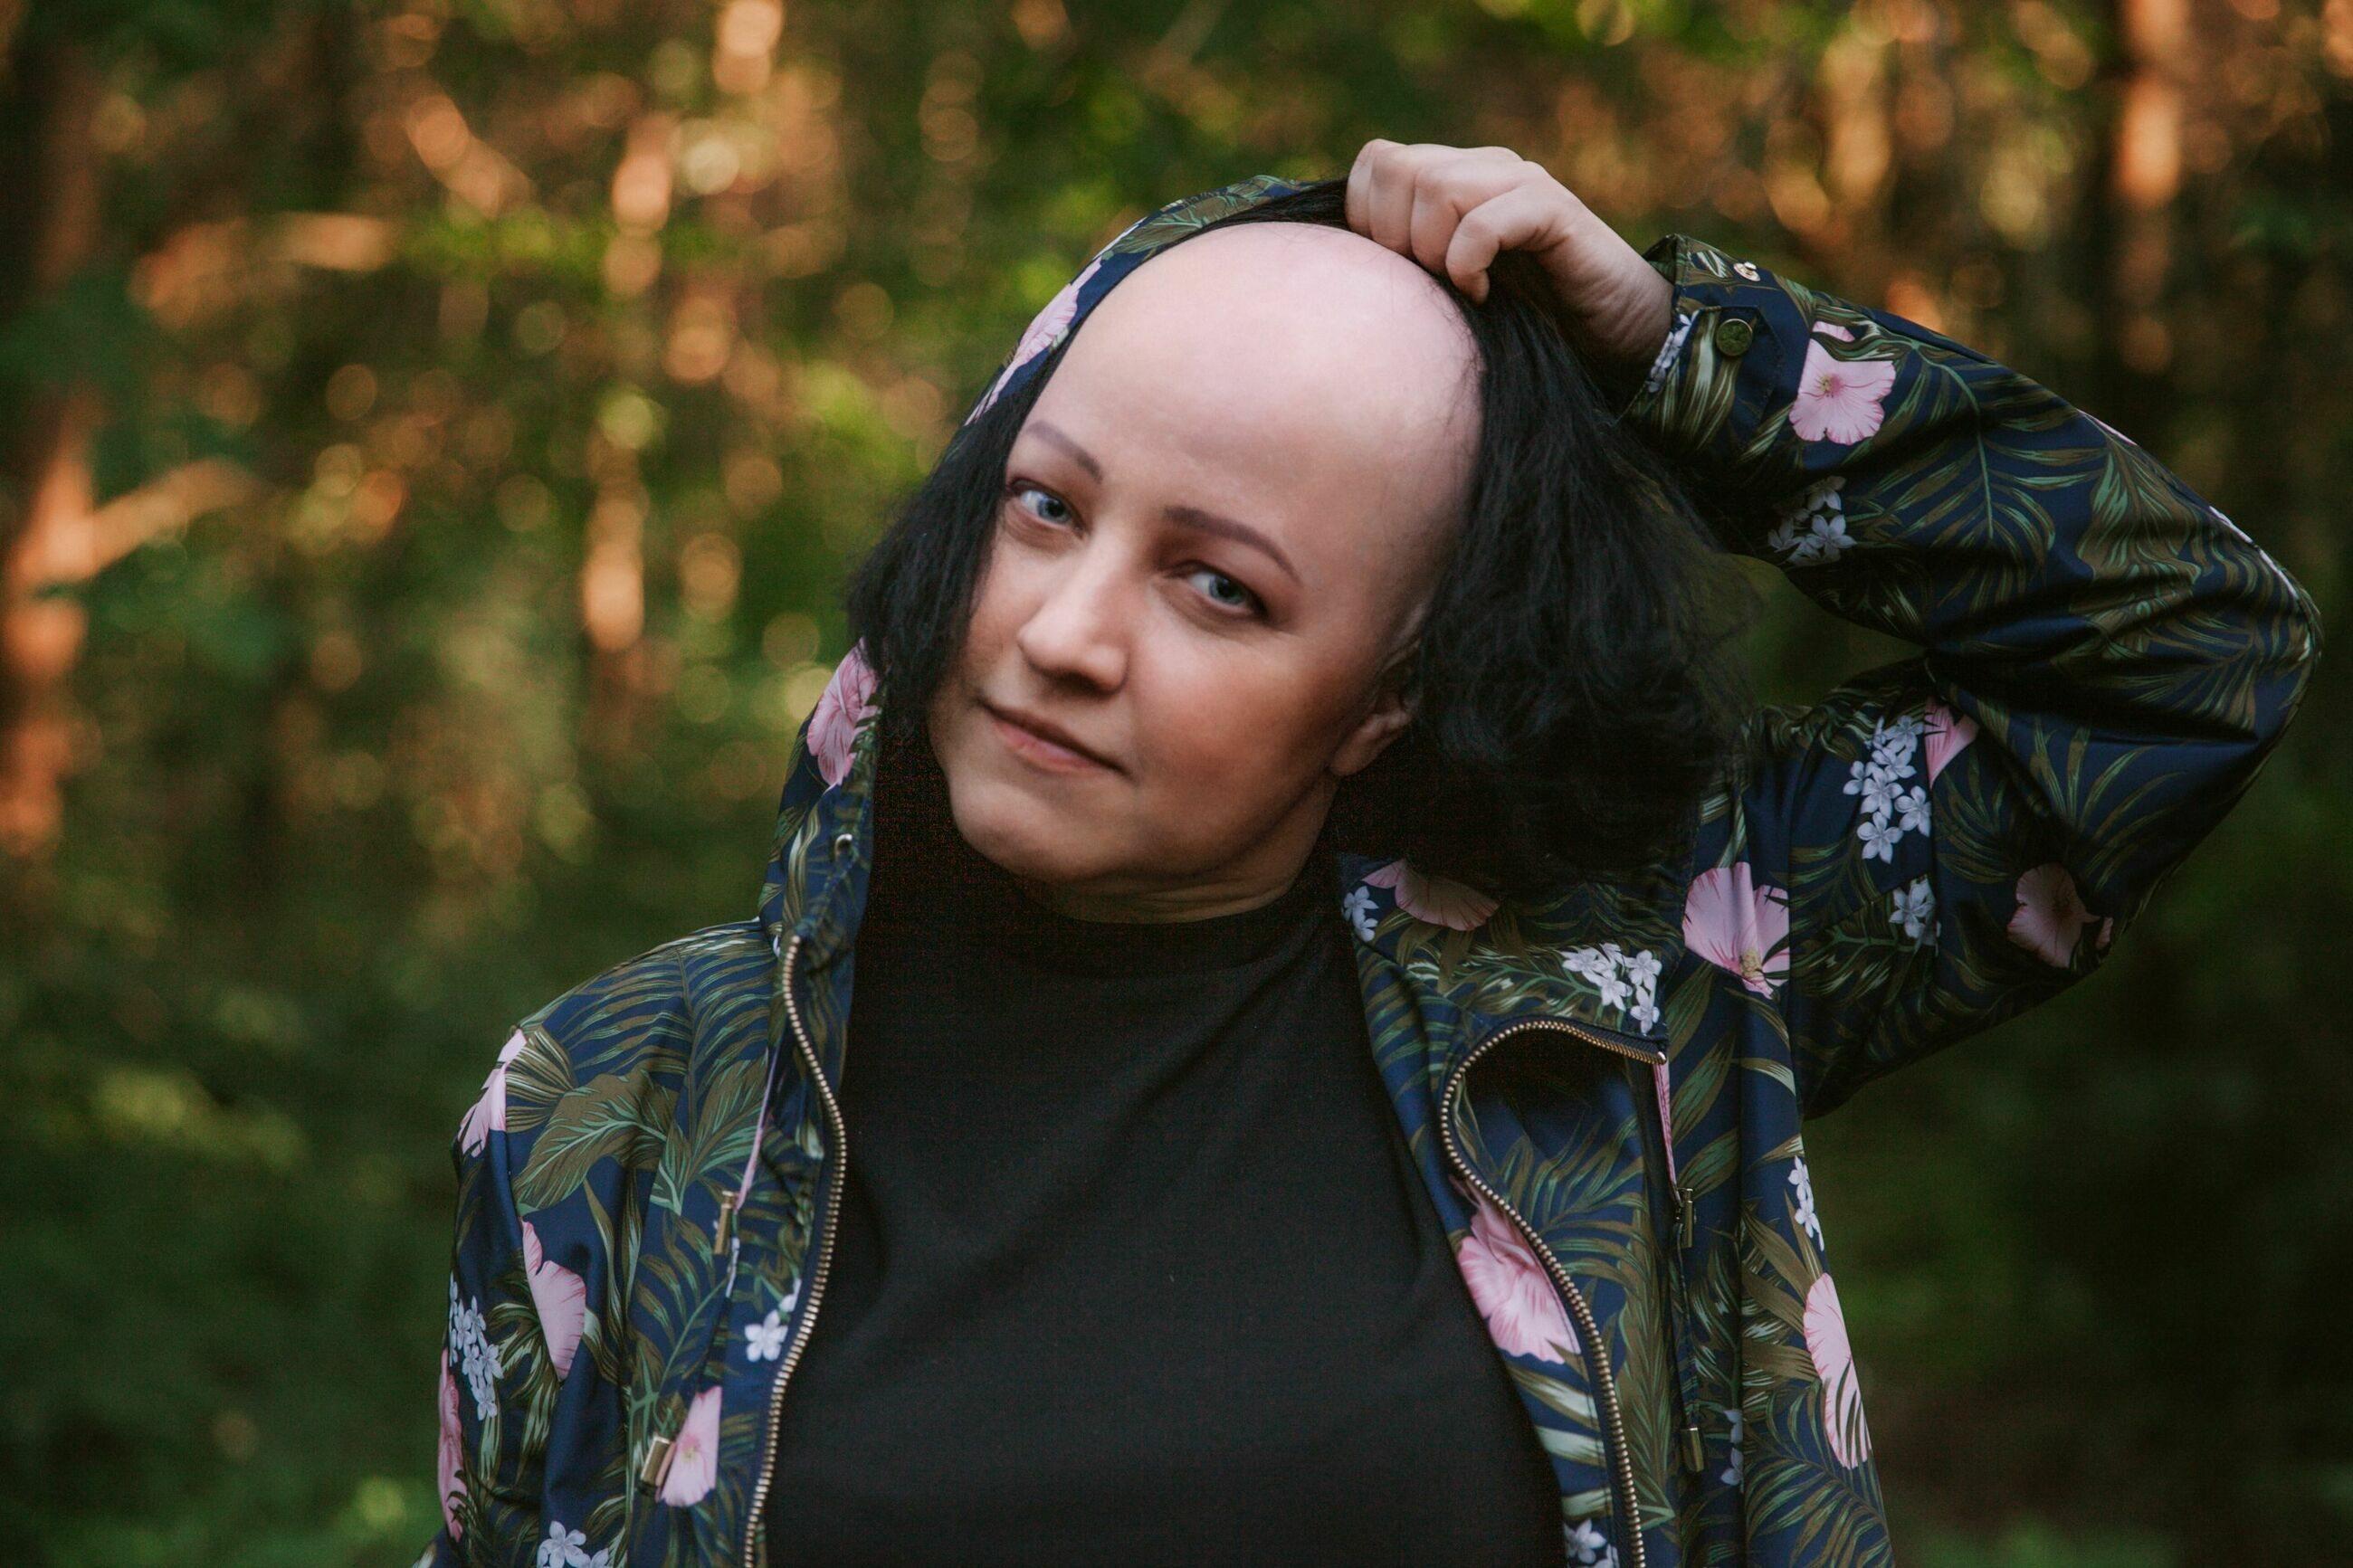 Marta Kawczyńska, fot. Olena Herasym